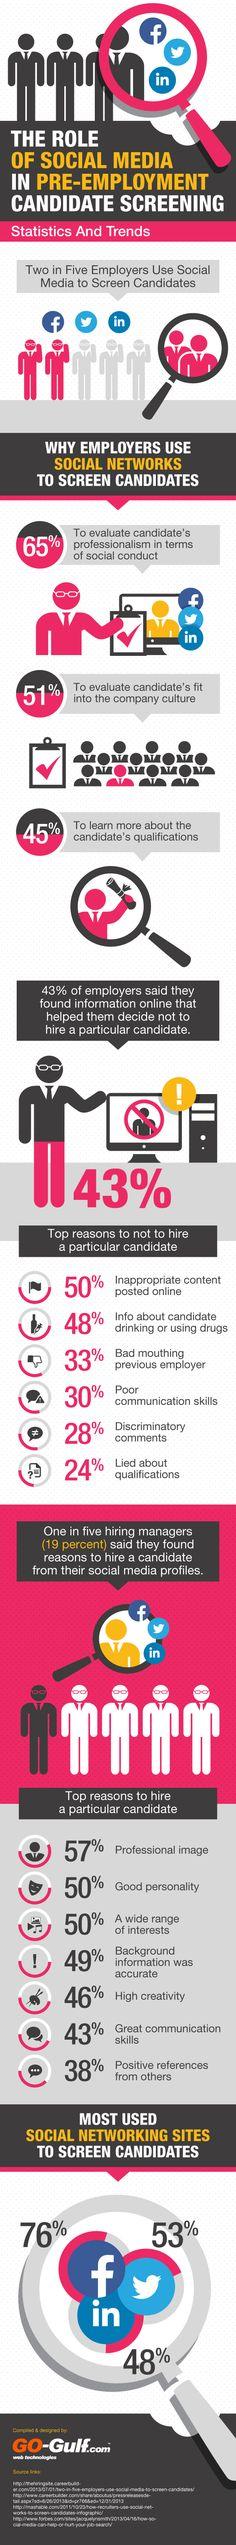 Pre-Employement Screening using Social Media